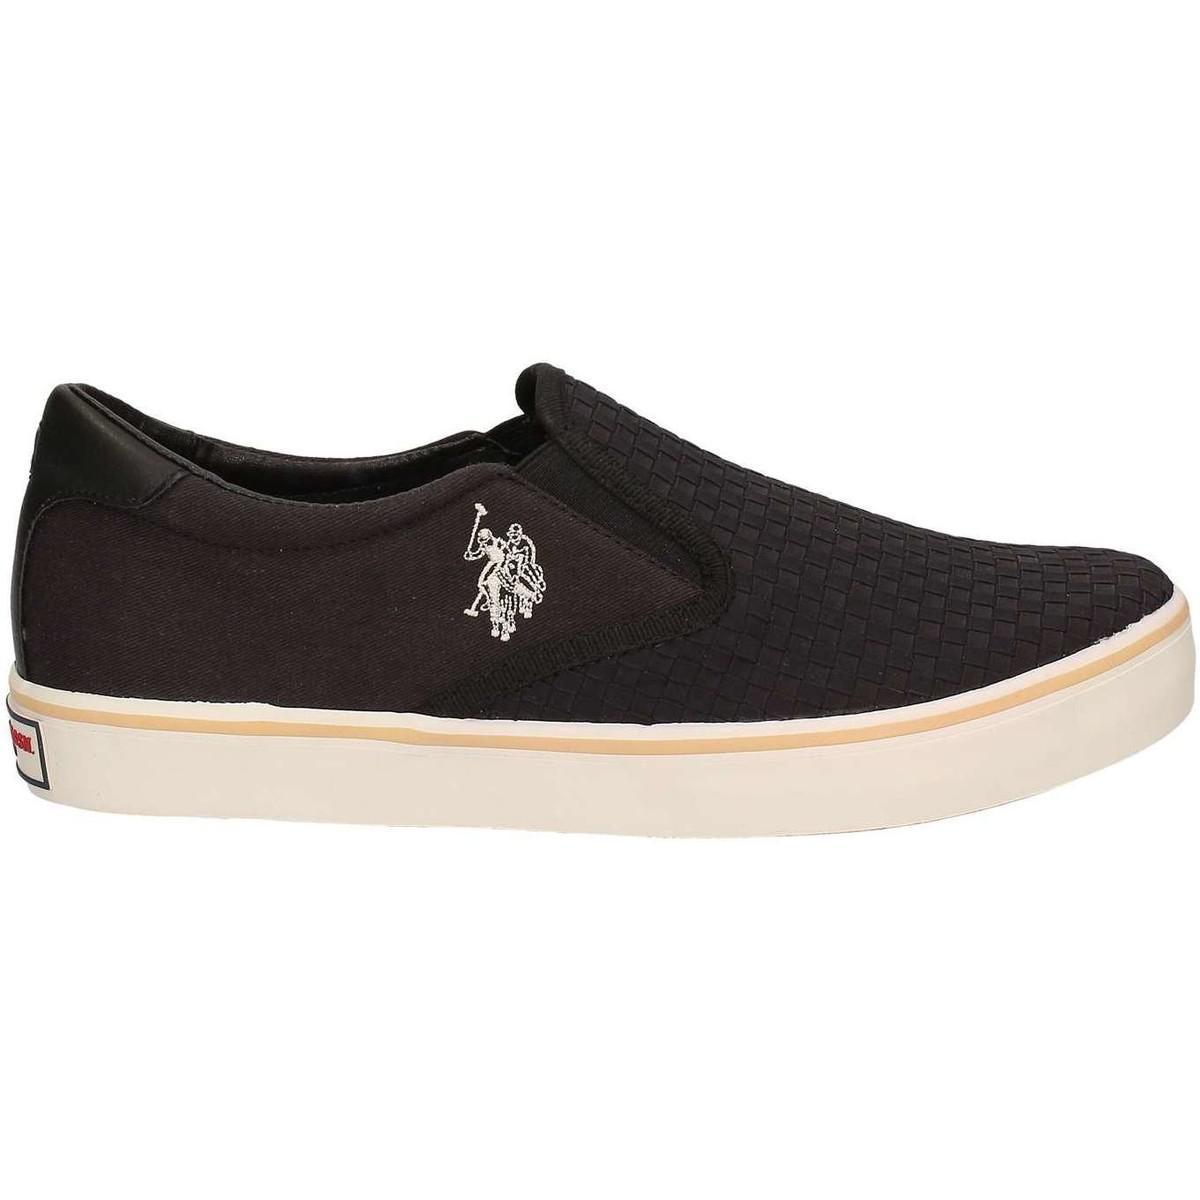 Latest U.S Polo Assn. U.S. Polo Assn. Galan4154s5/Ty2 Slip-On Black Slip On Shoes for Men Sale Online